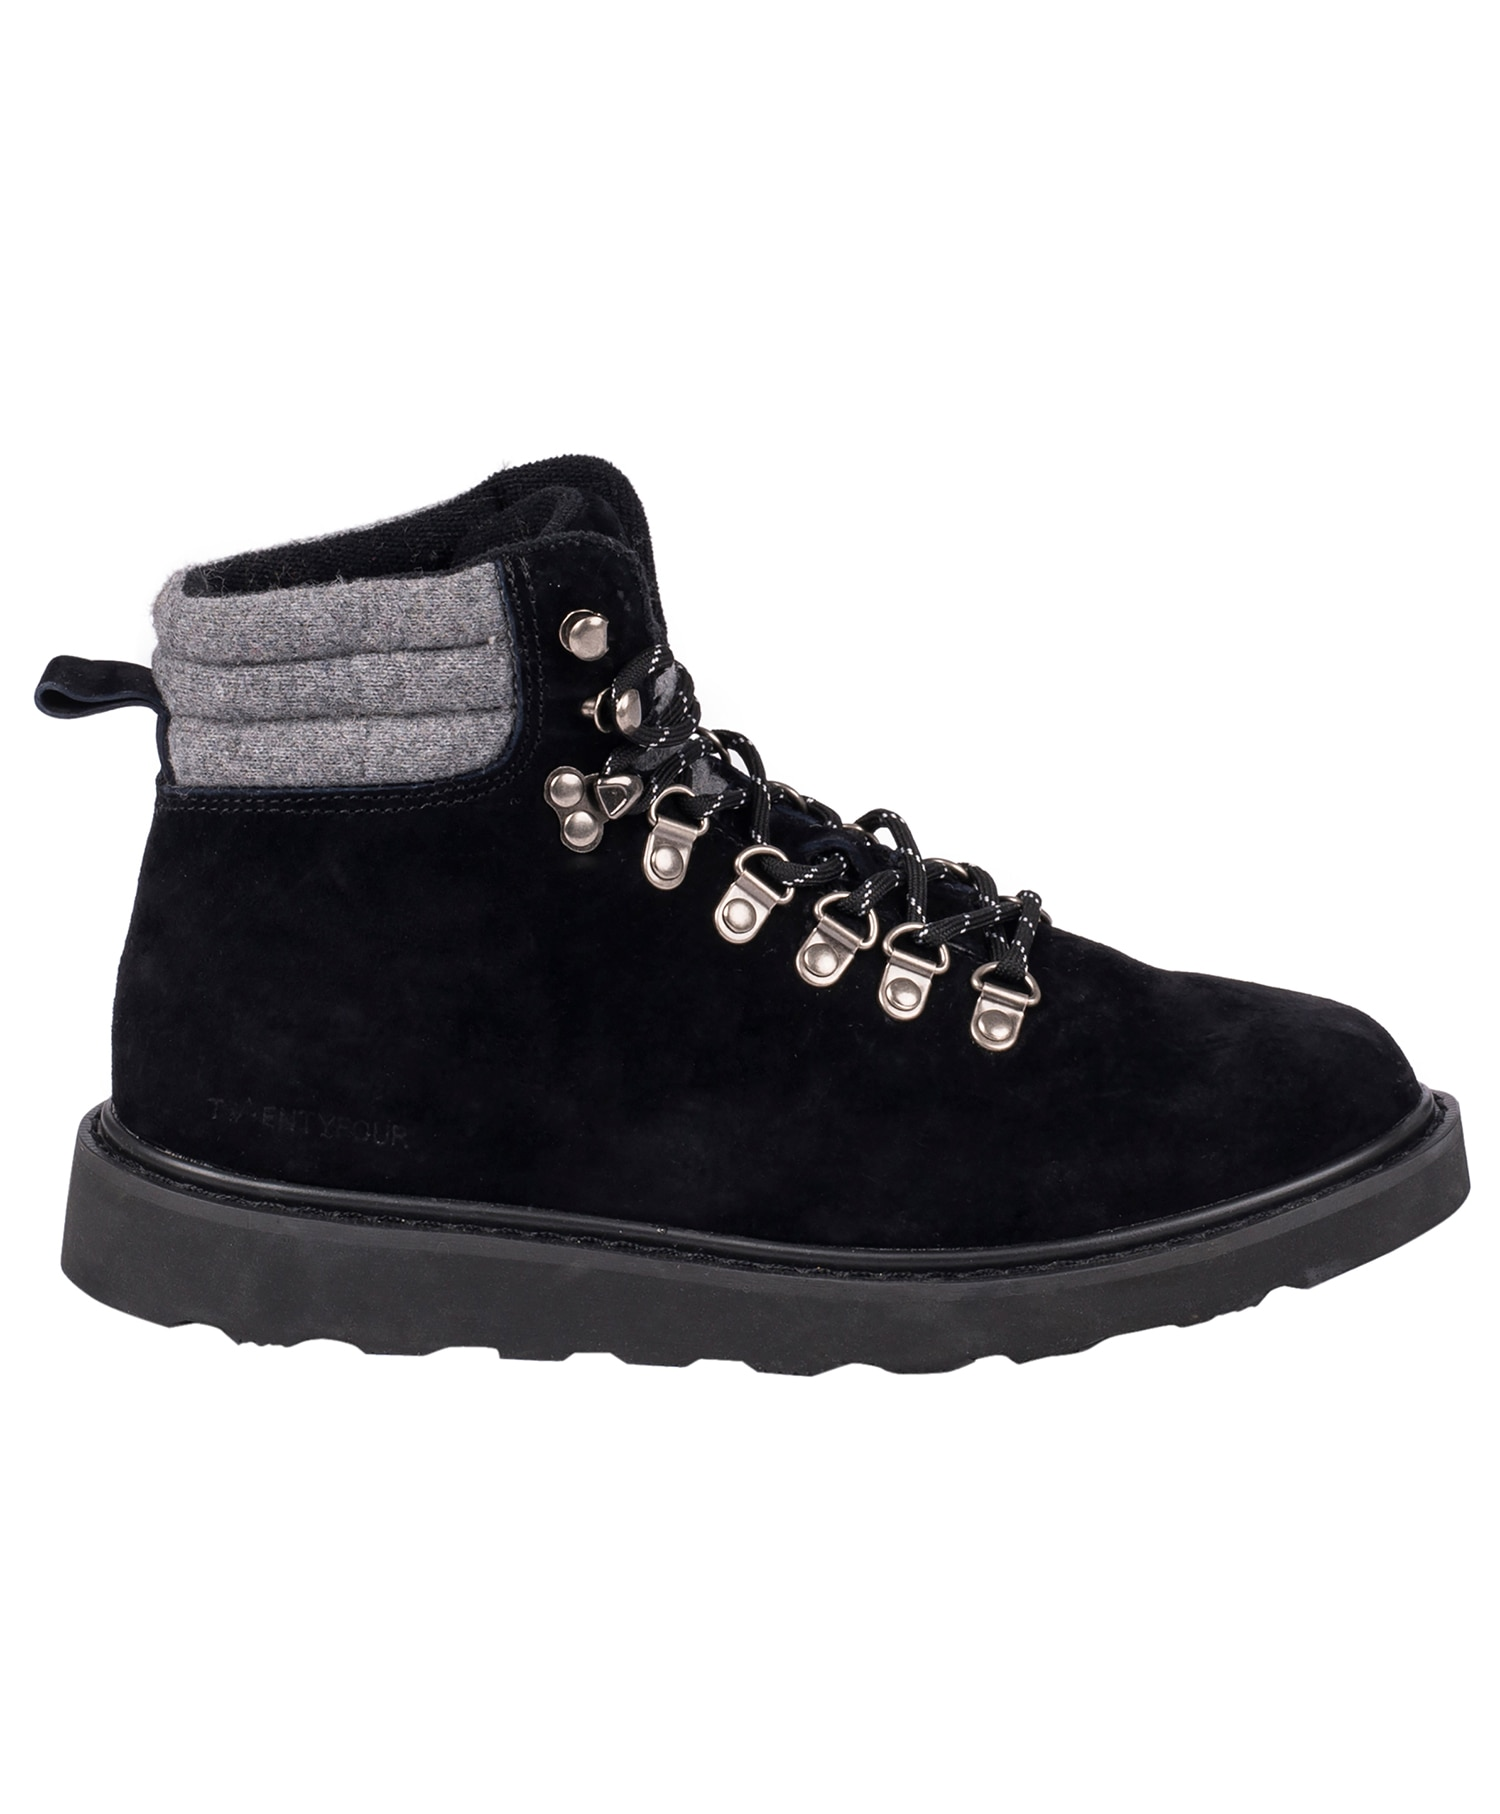 Twentyfour Finse Rallar Boot